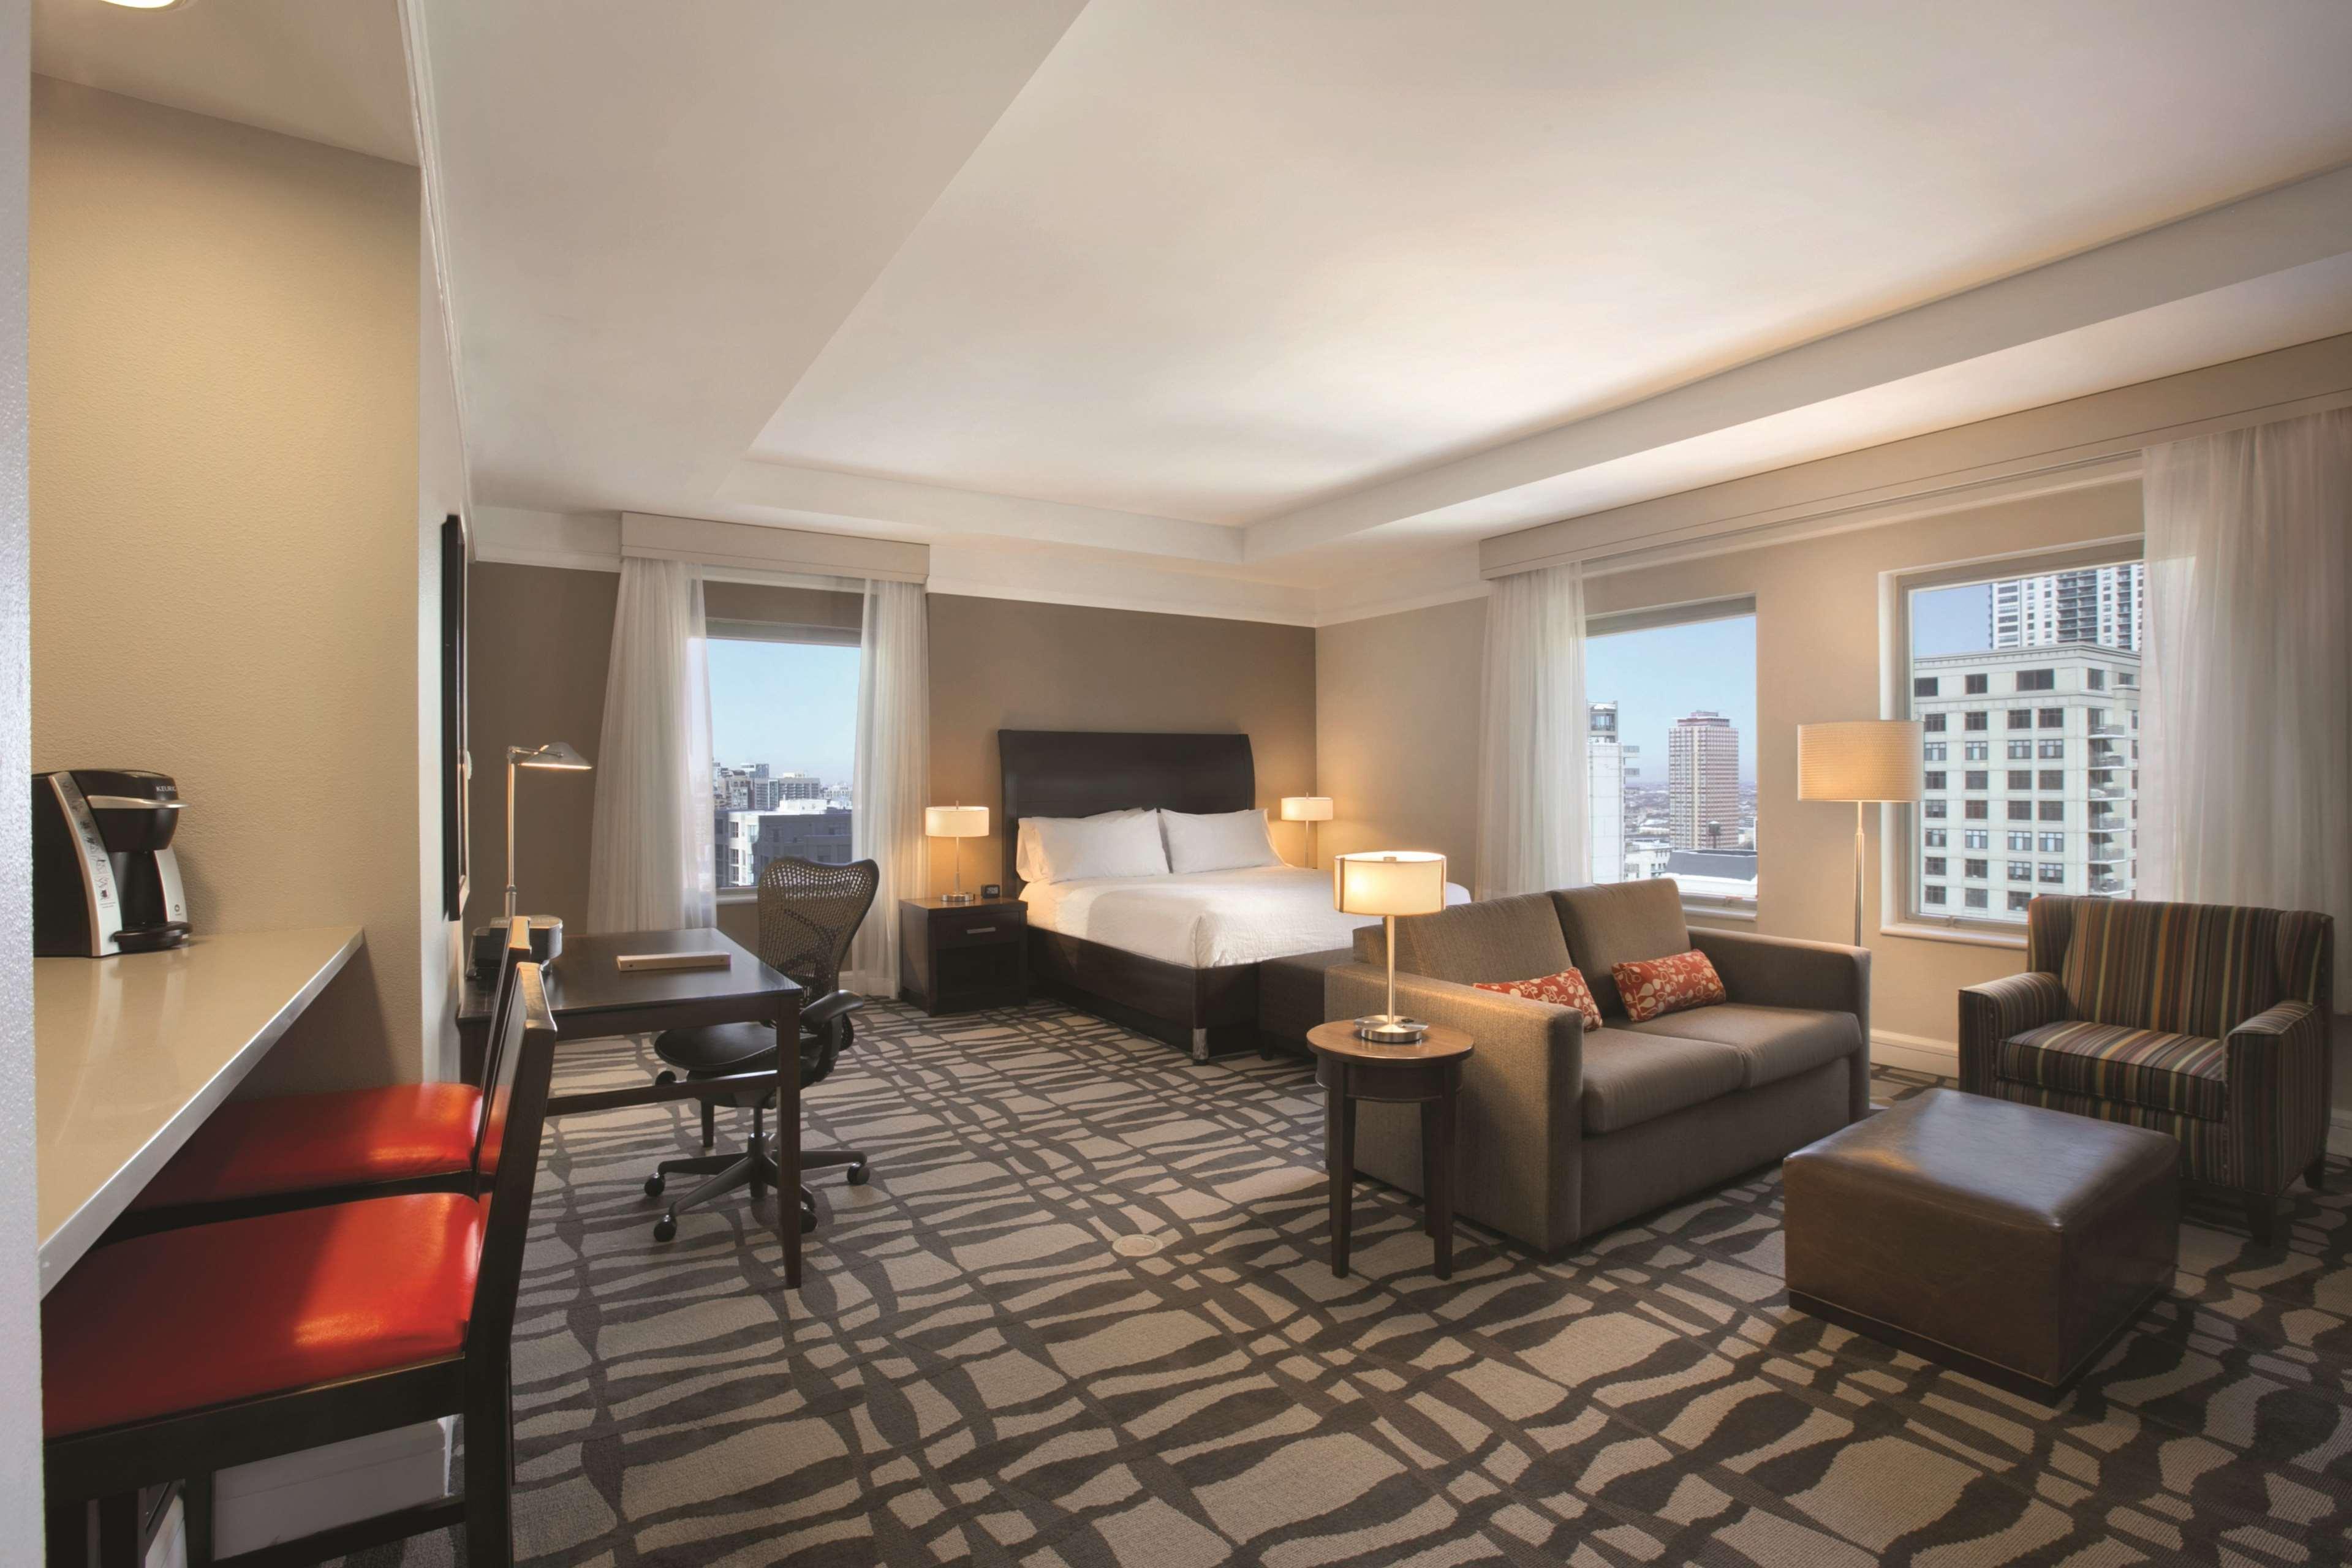 Hilton Garden Inn Chicago Downtown/Magnificent Mile image 31